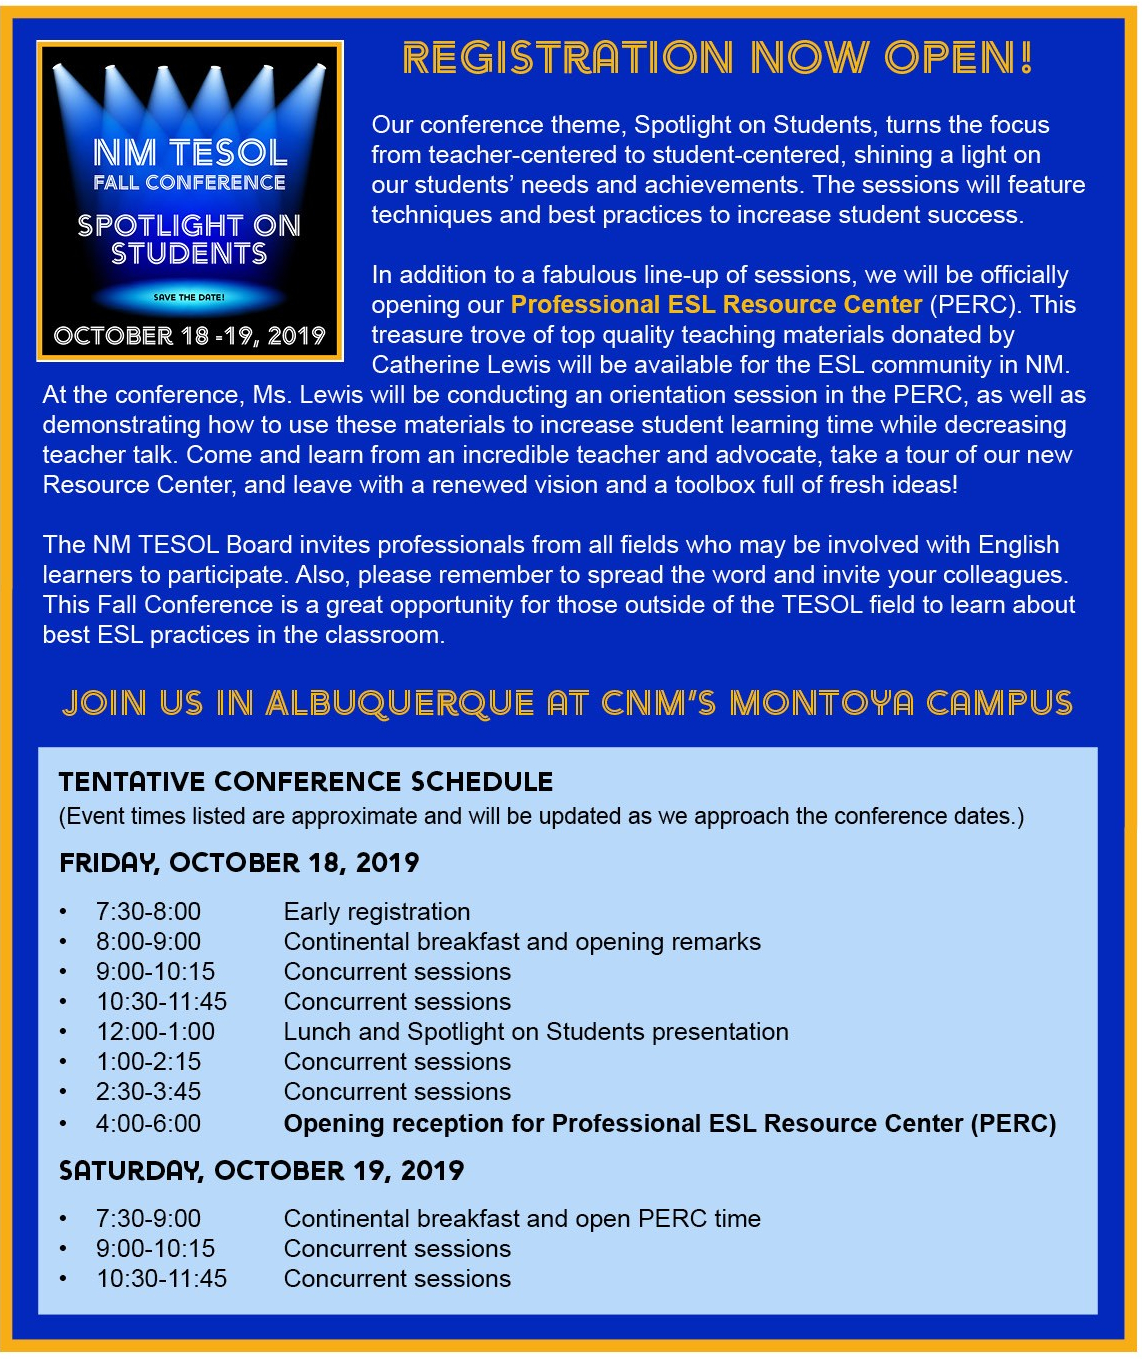 nm-tesol-fall-conference-info-blurb.jpg